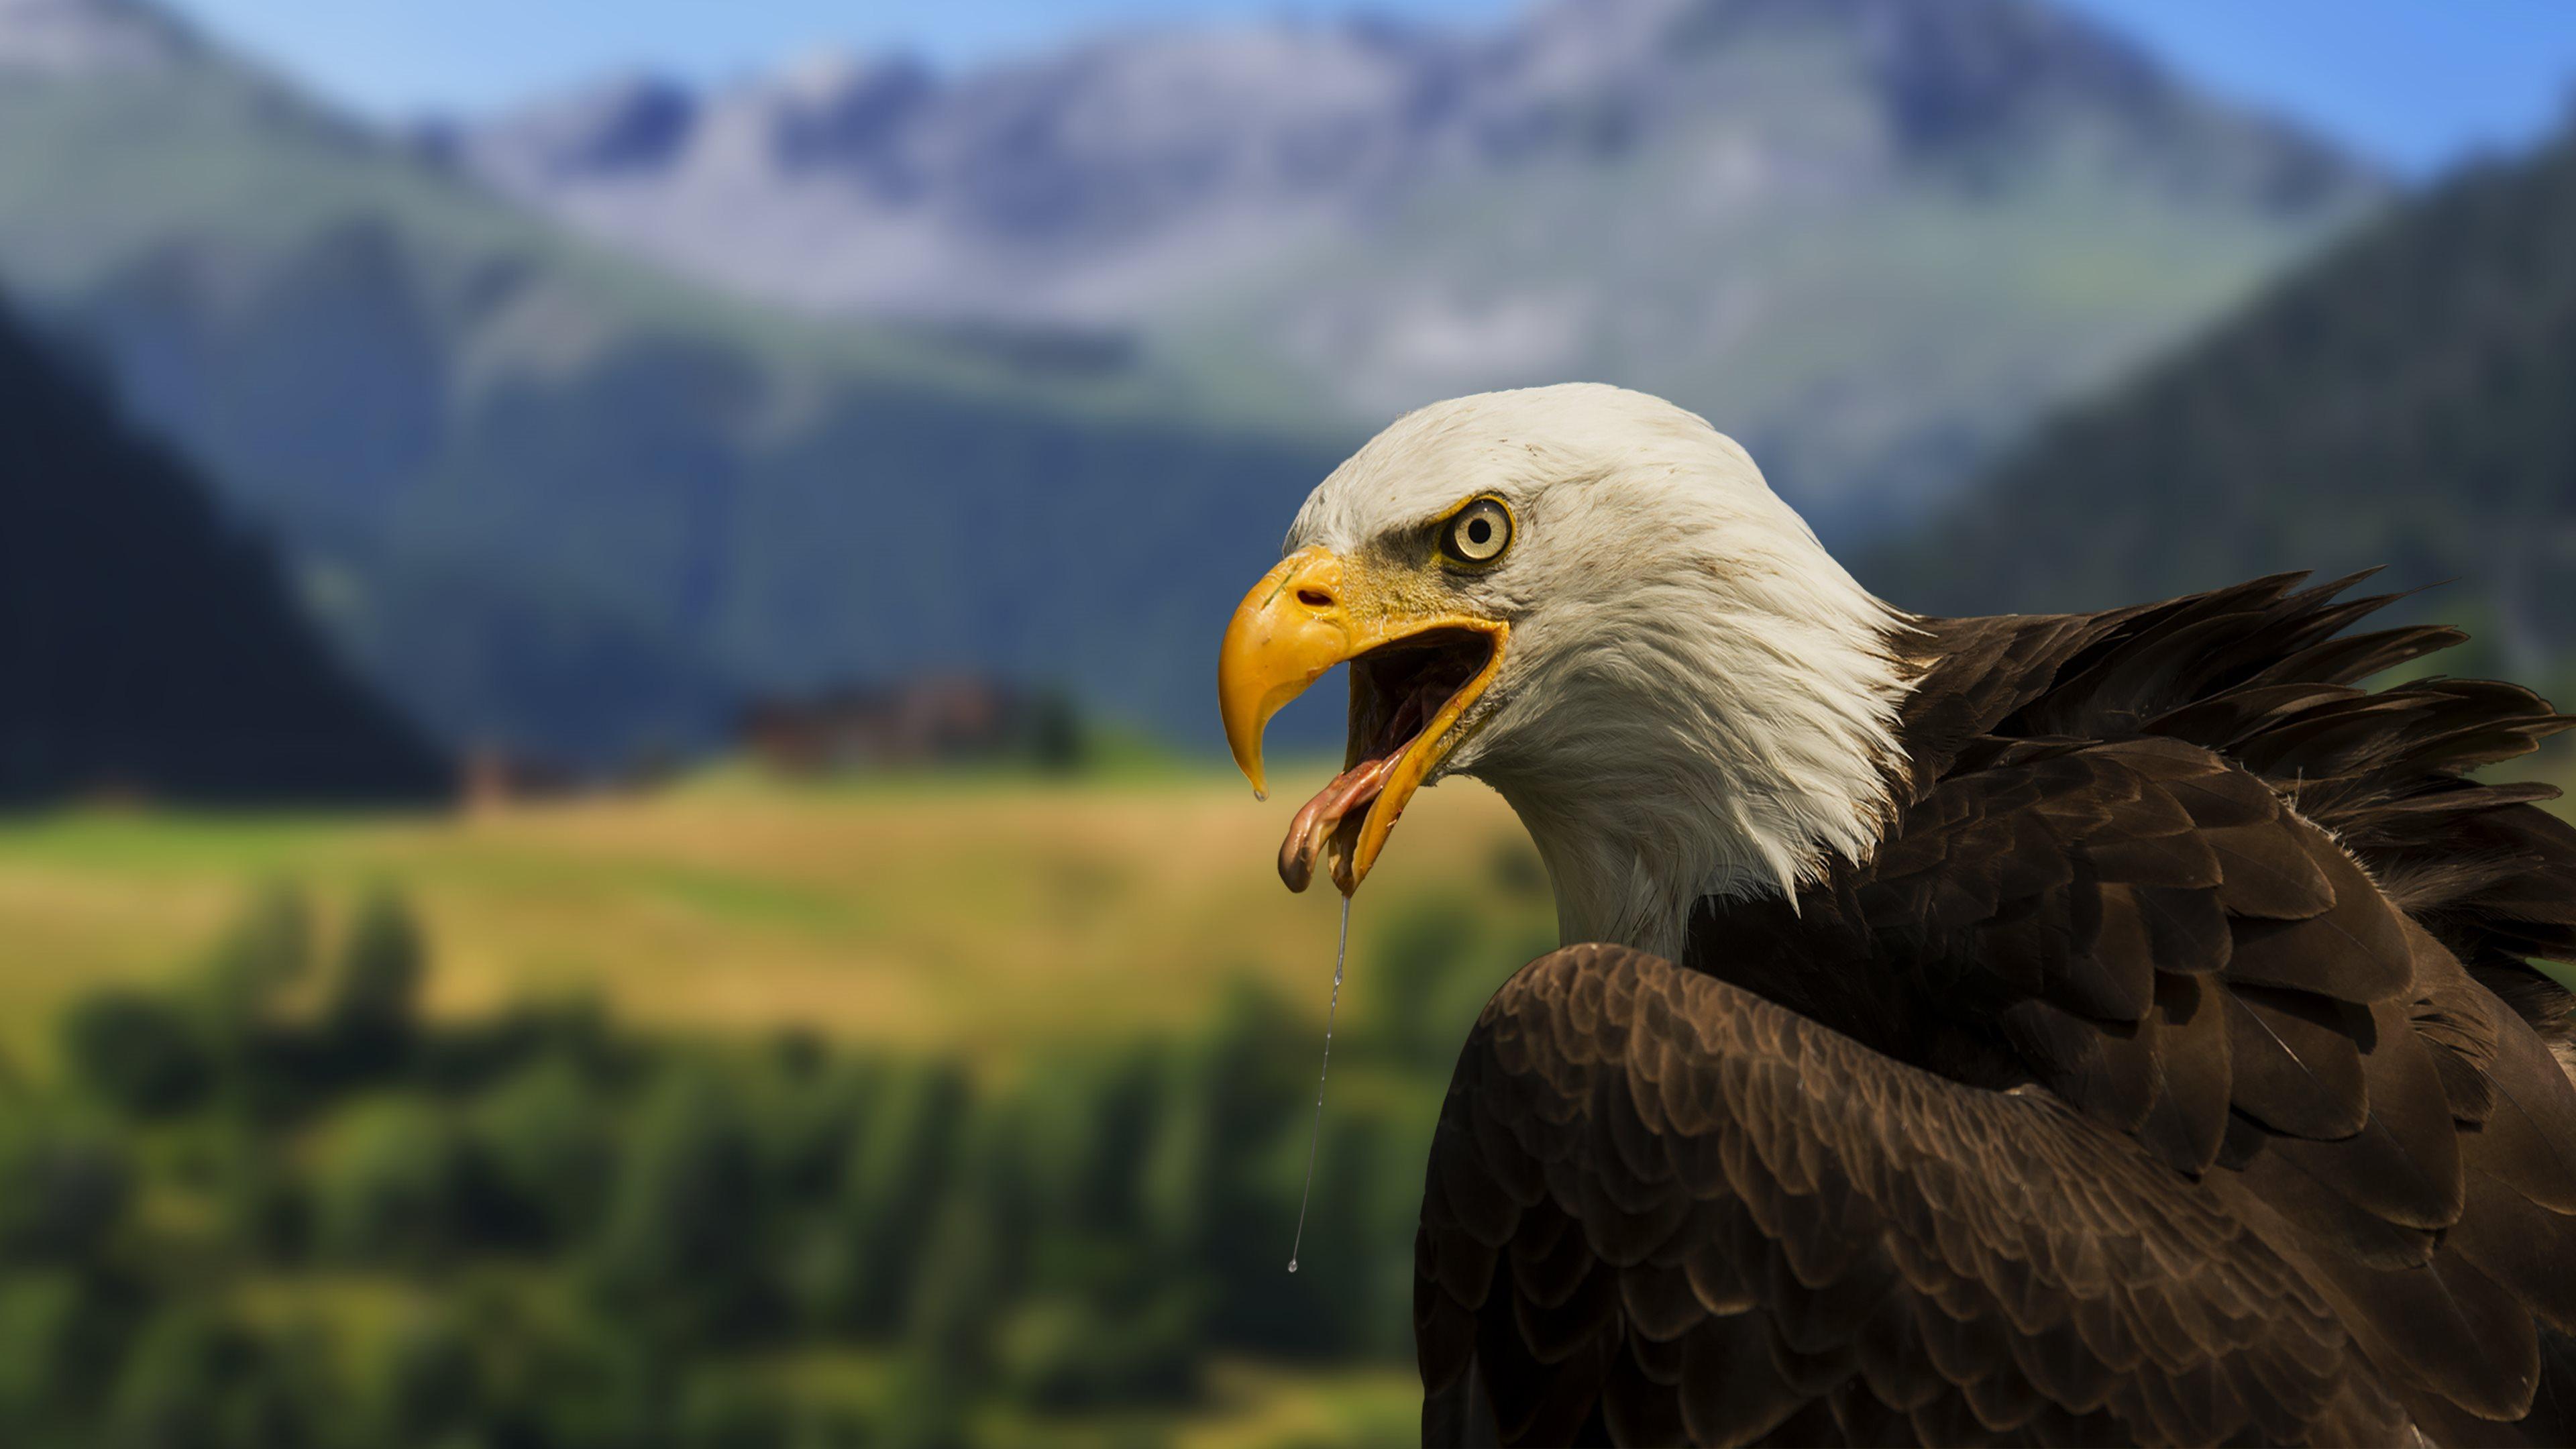 Bald Eagle 4K Wallpaper Full 1080p Ultra HD Wallpapers 3840x2160